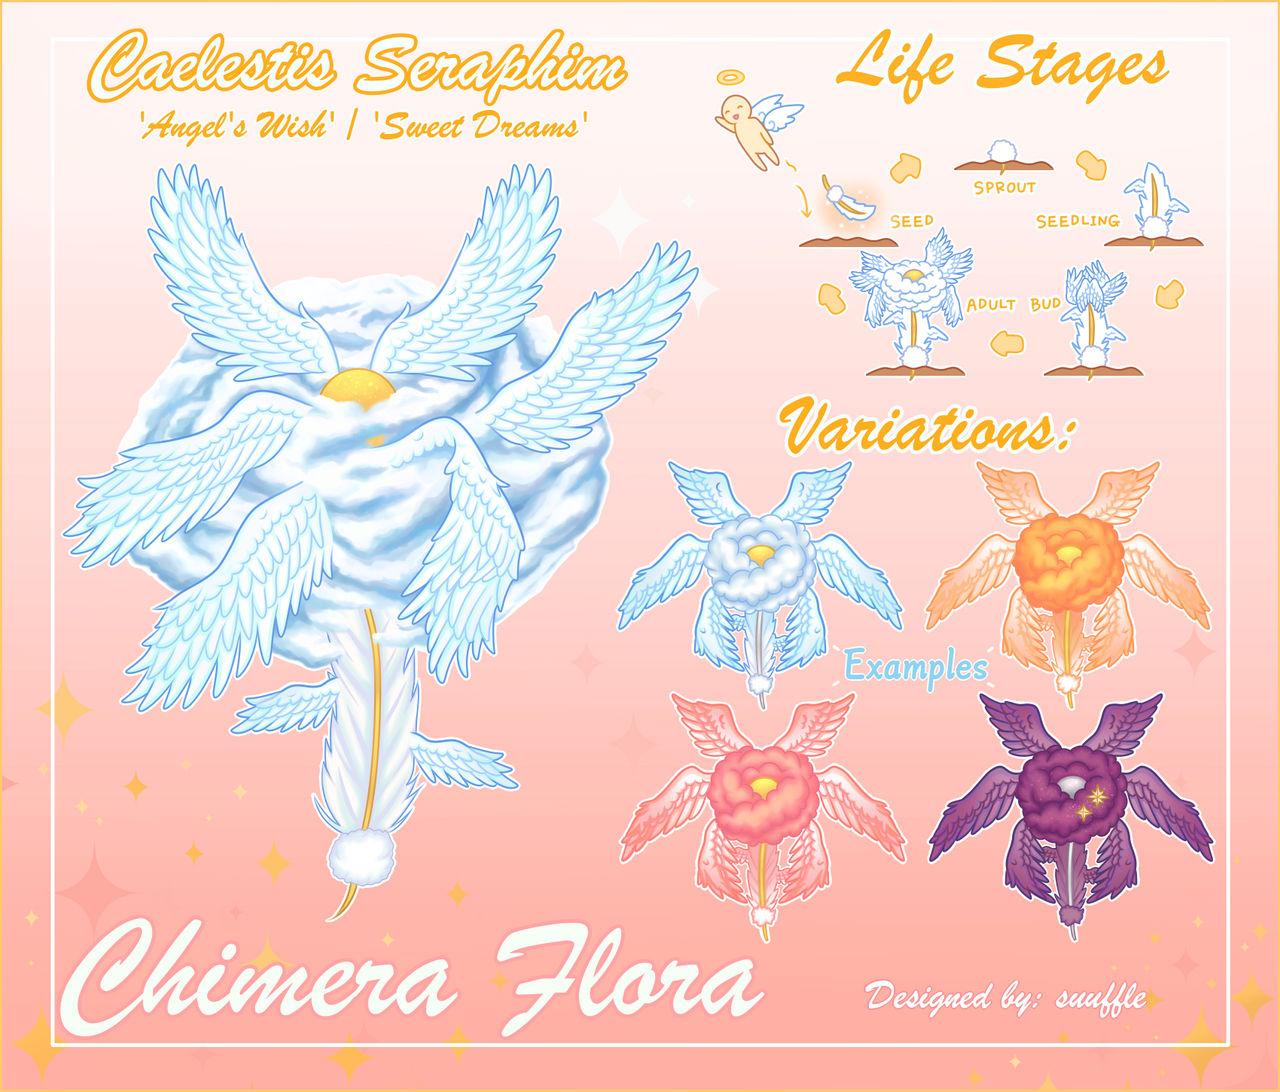 {CE} Chimera Flora Entry